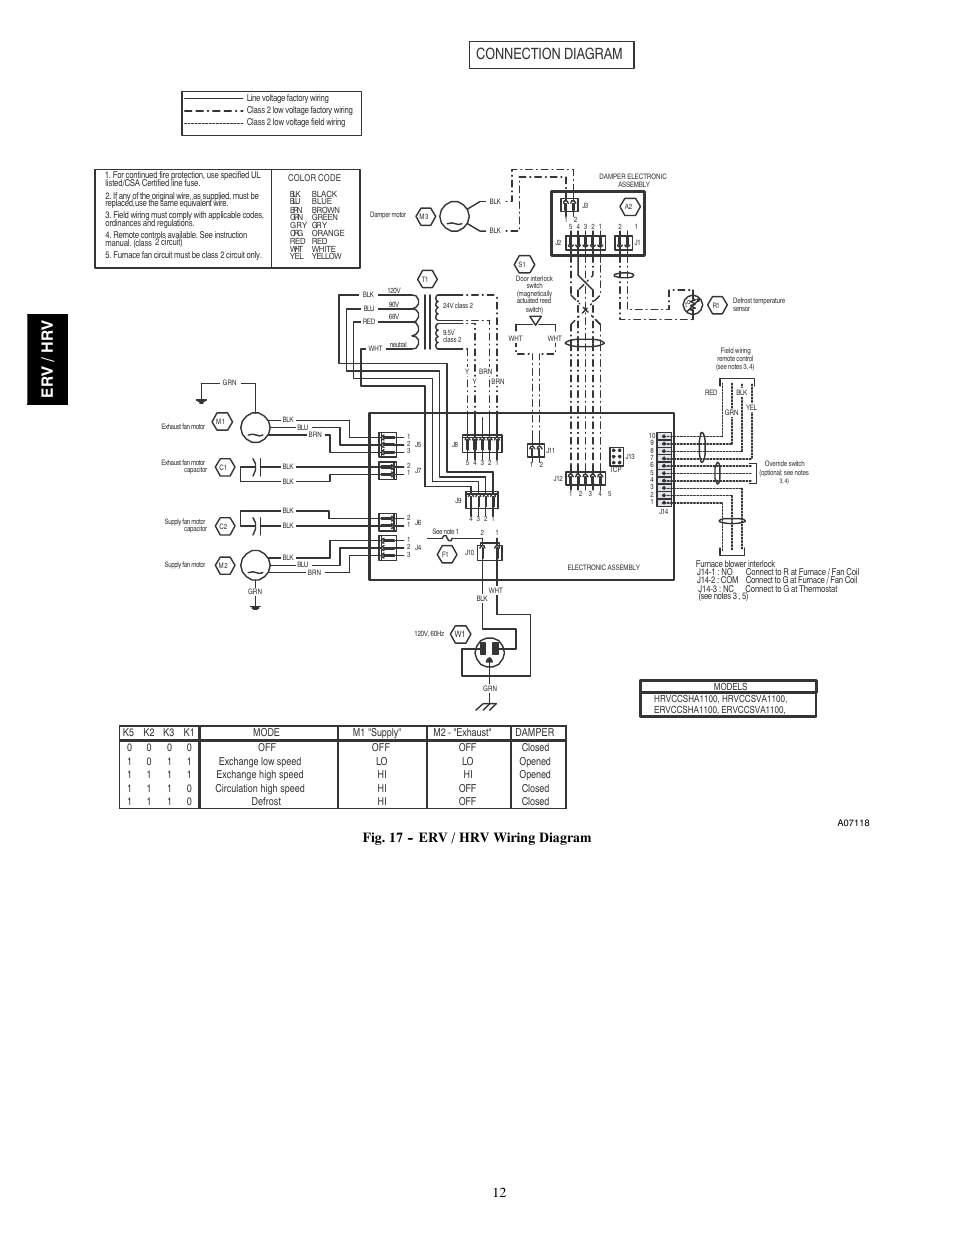 medium resolution of 17 erv hrv wiring diagram bryant energy heat recovery ventilator ervbbsva1100 user manual page 12 13